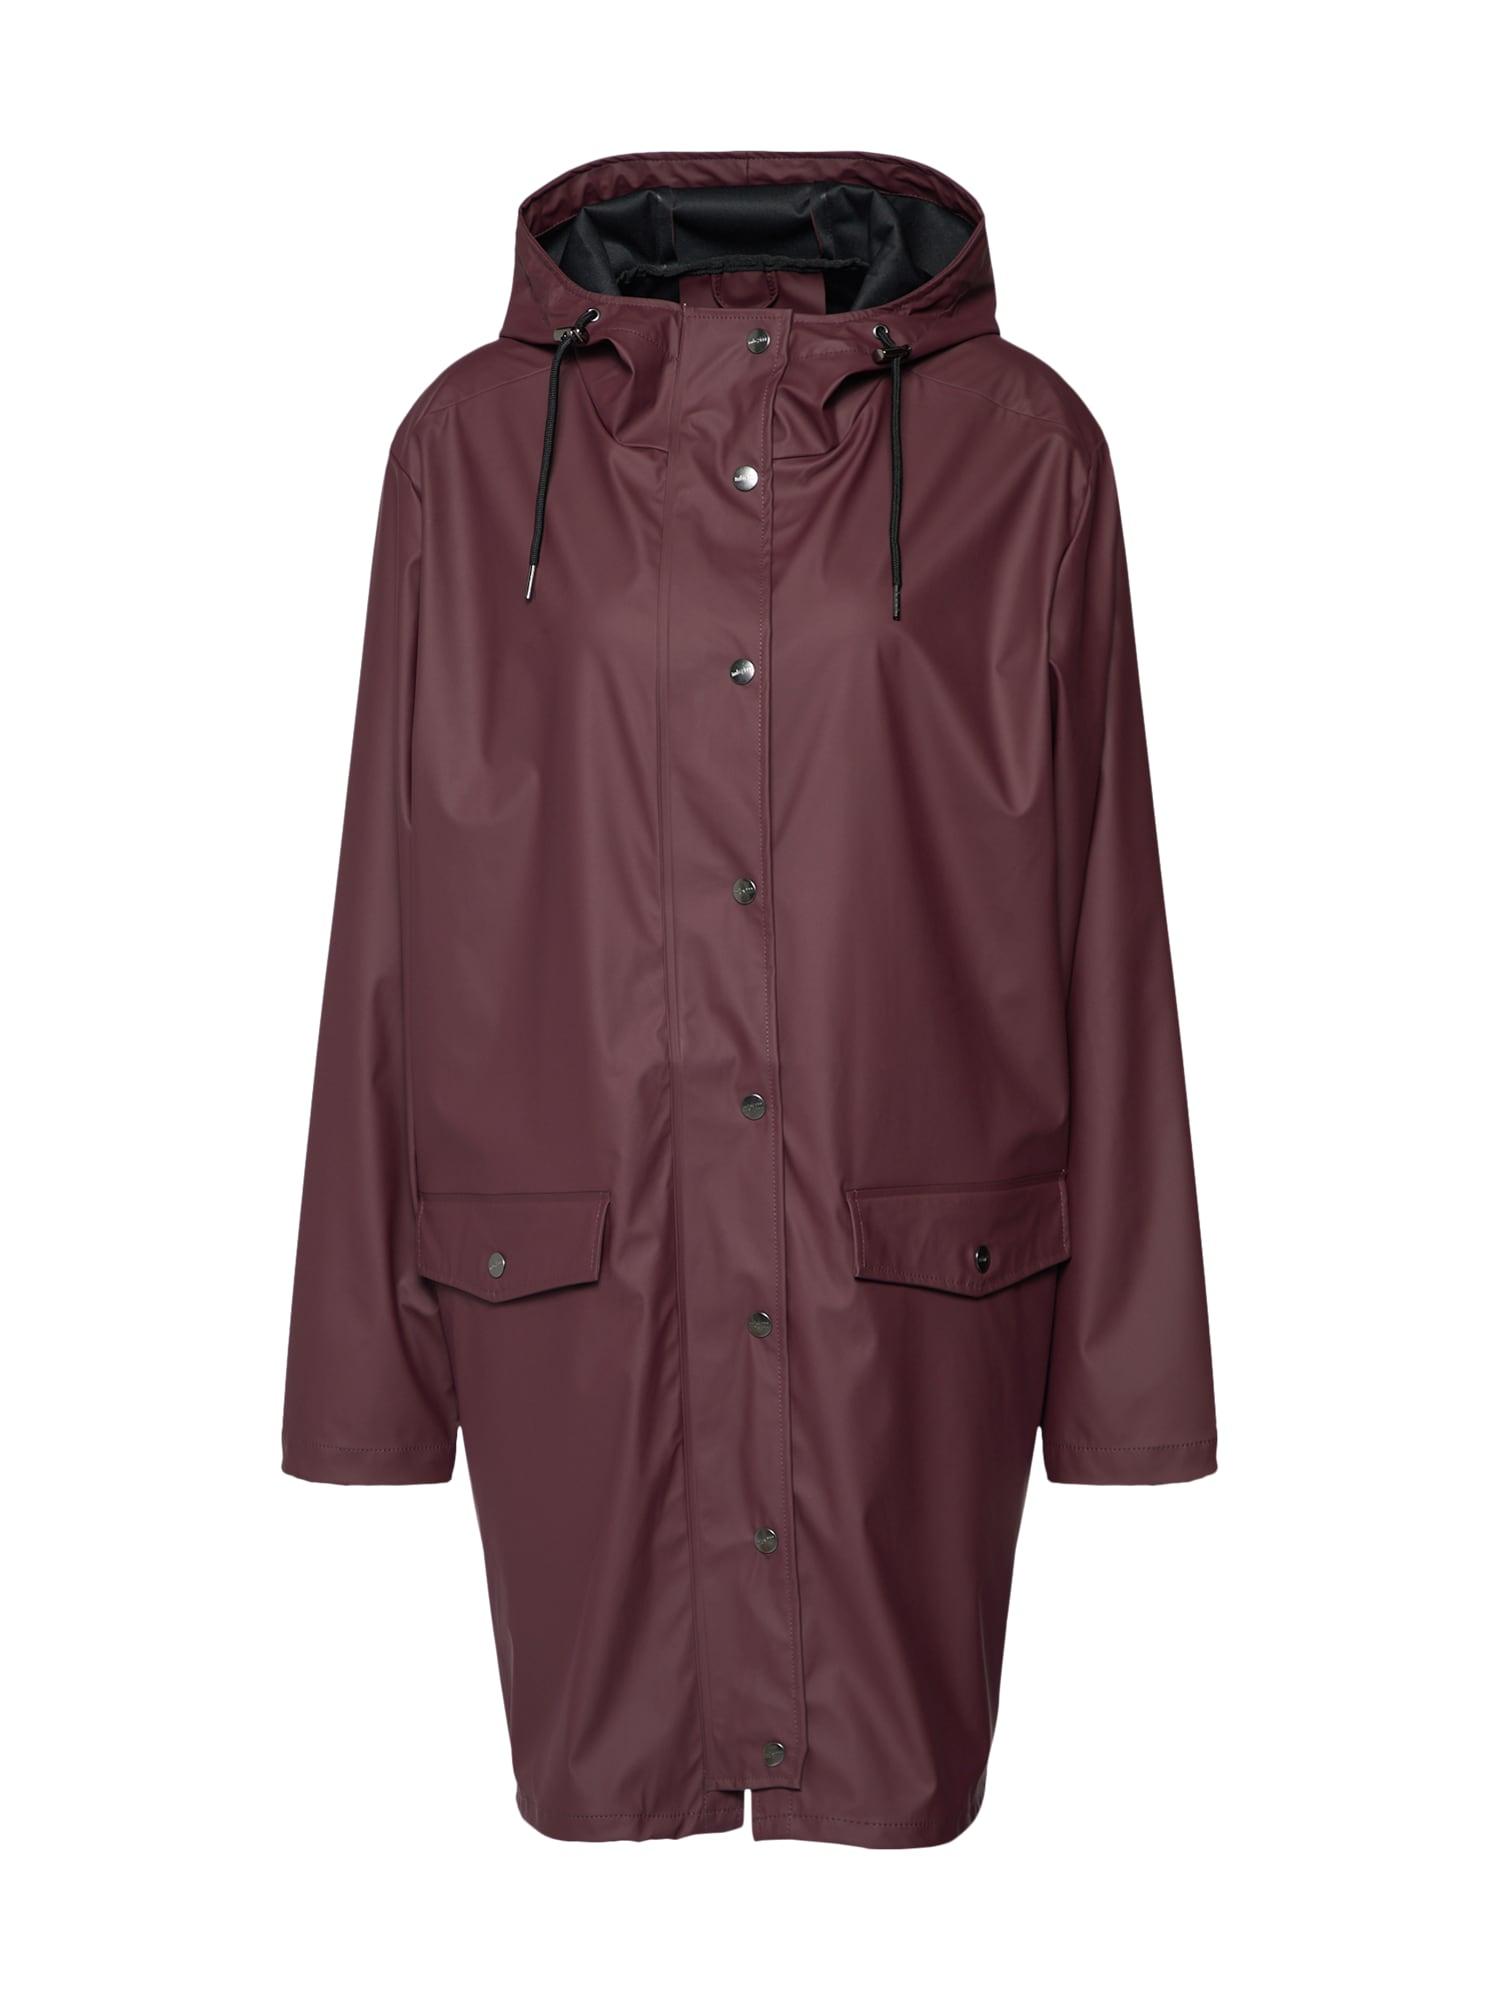 Přechodný kabát Fabiola bordó Mbym